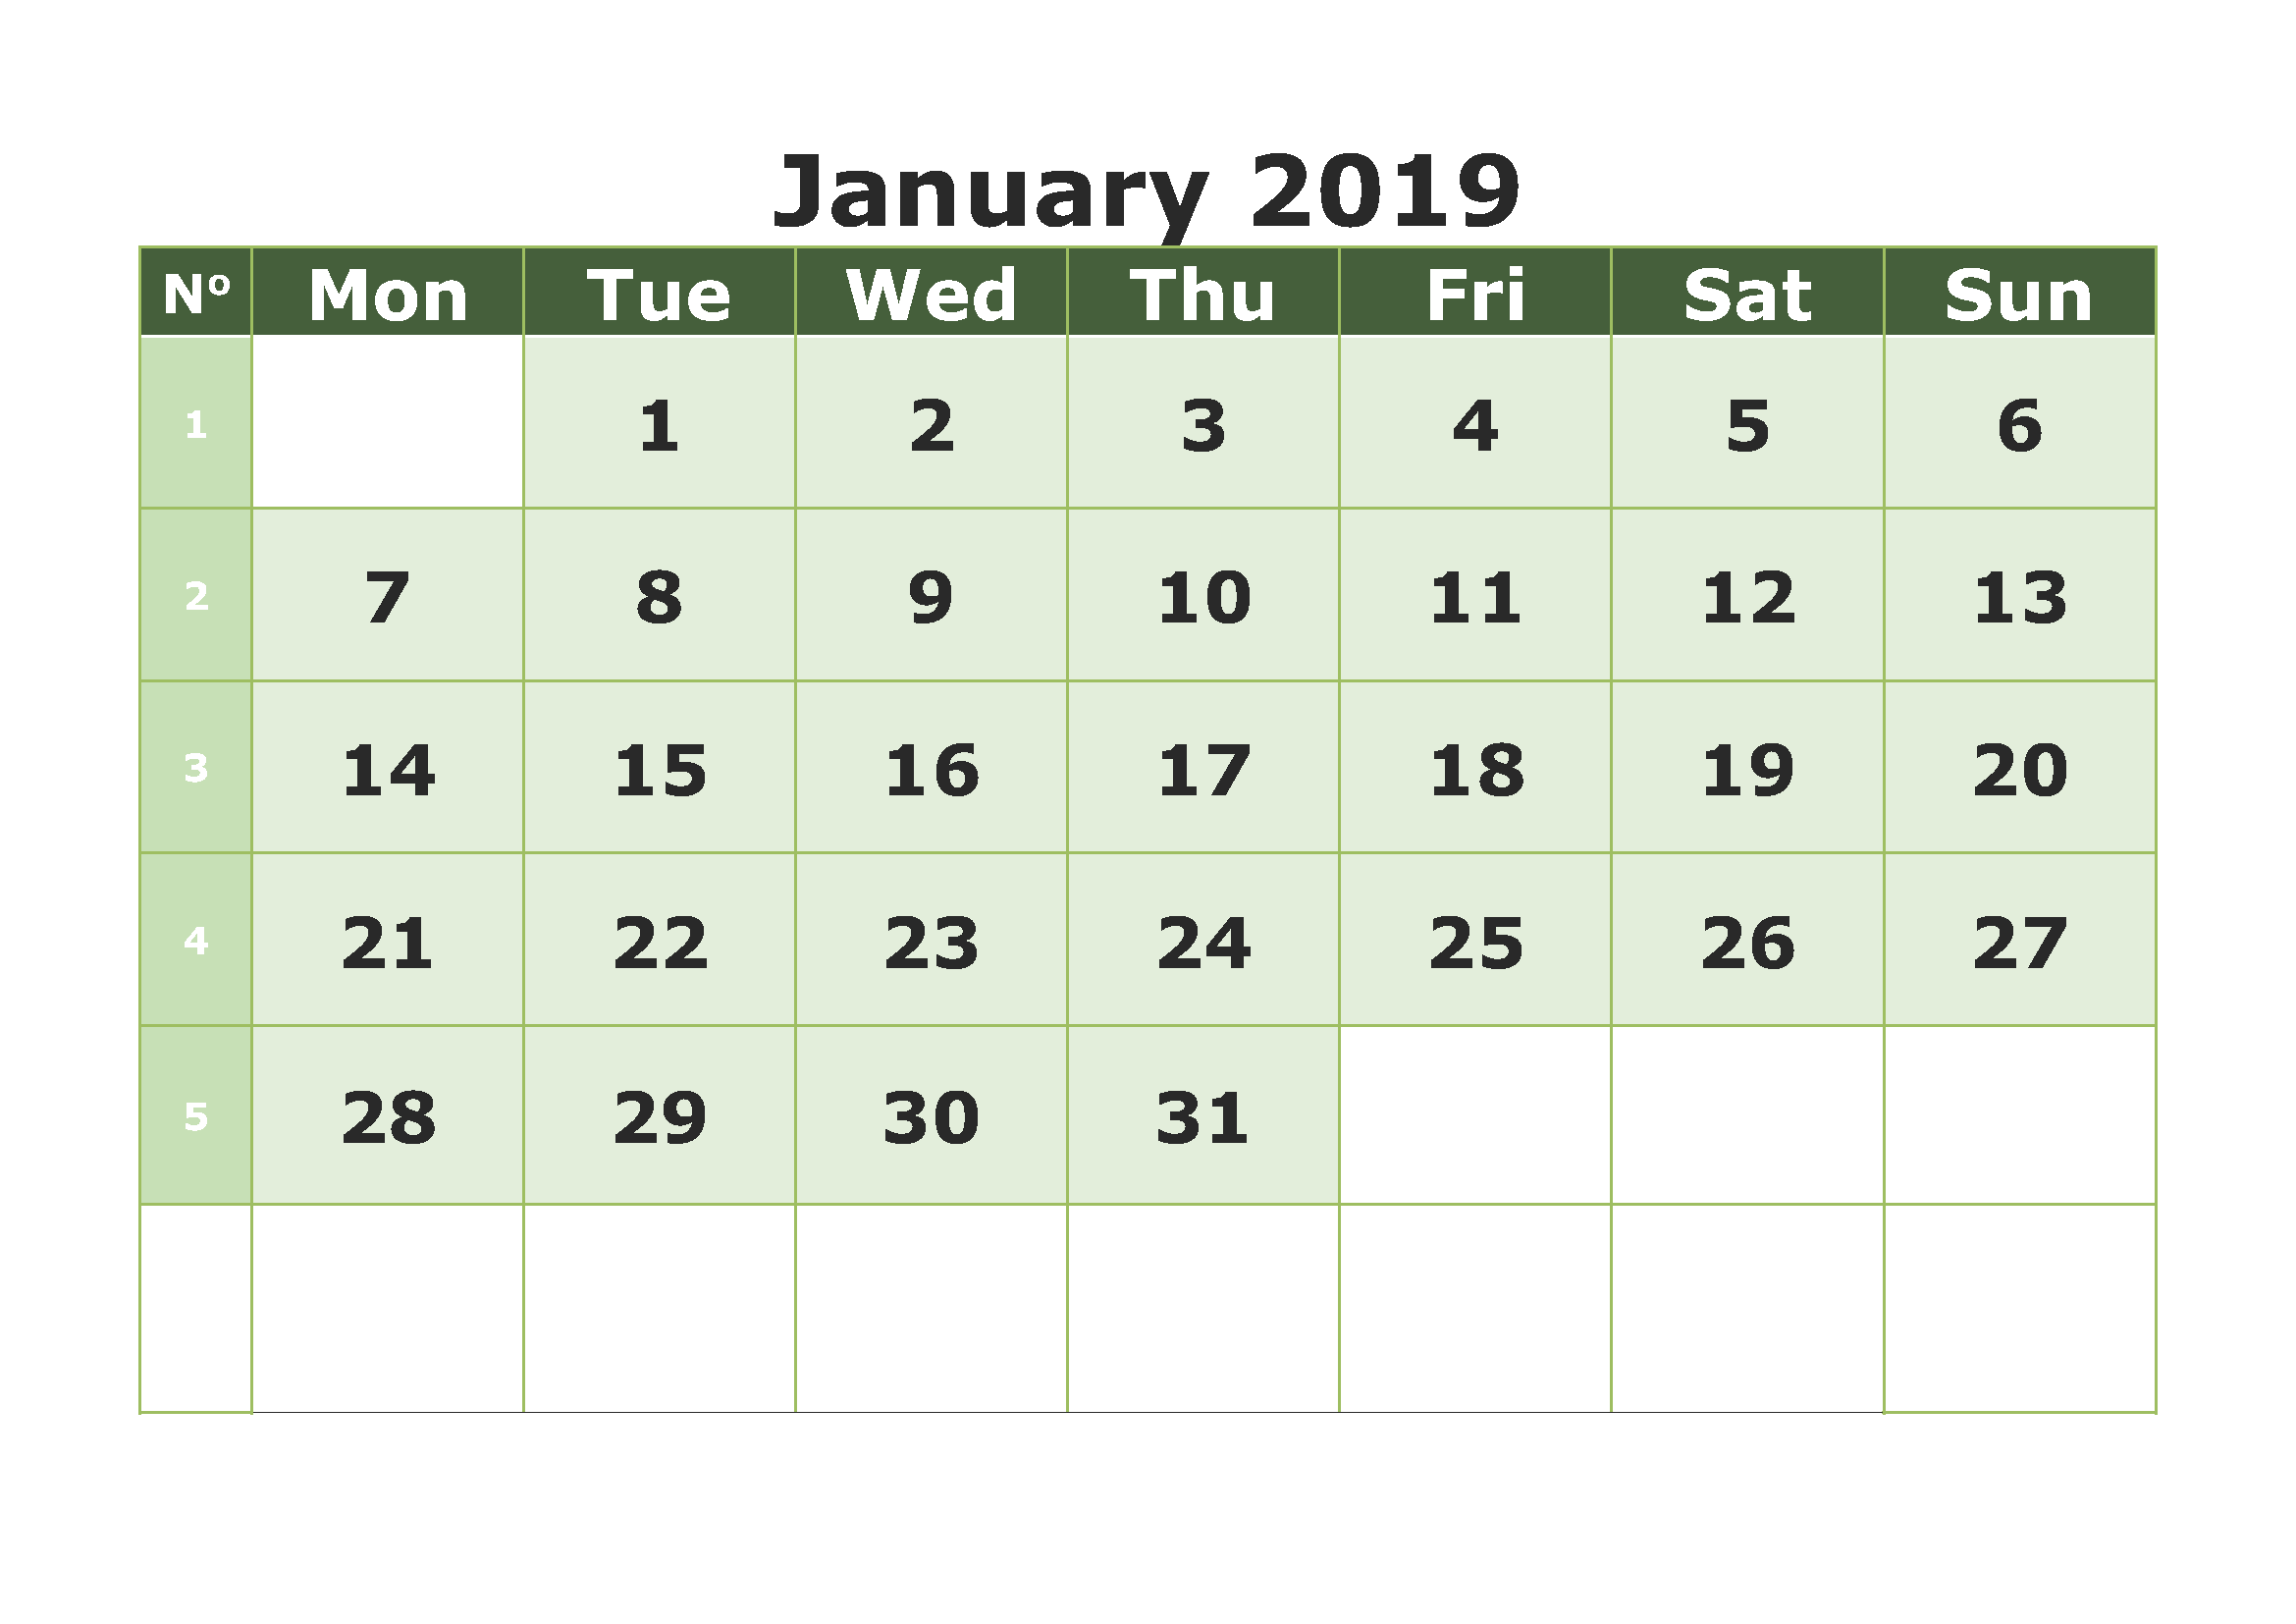 january 2019 calendar template excel sheet january calendar 2019